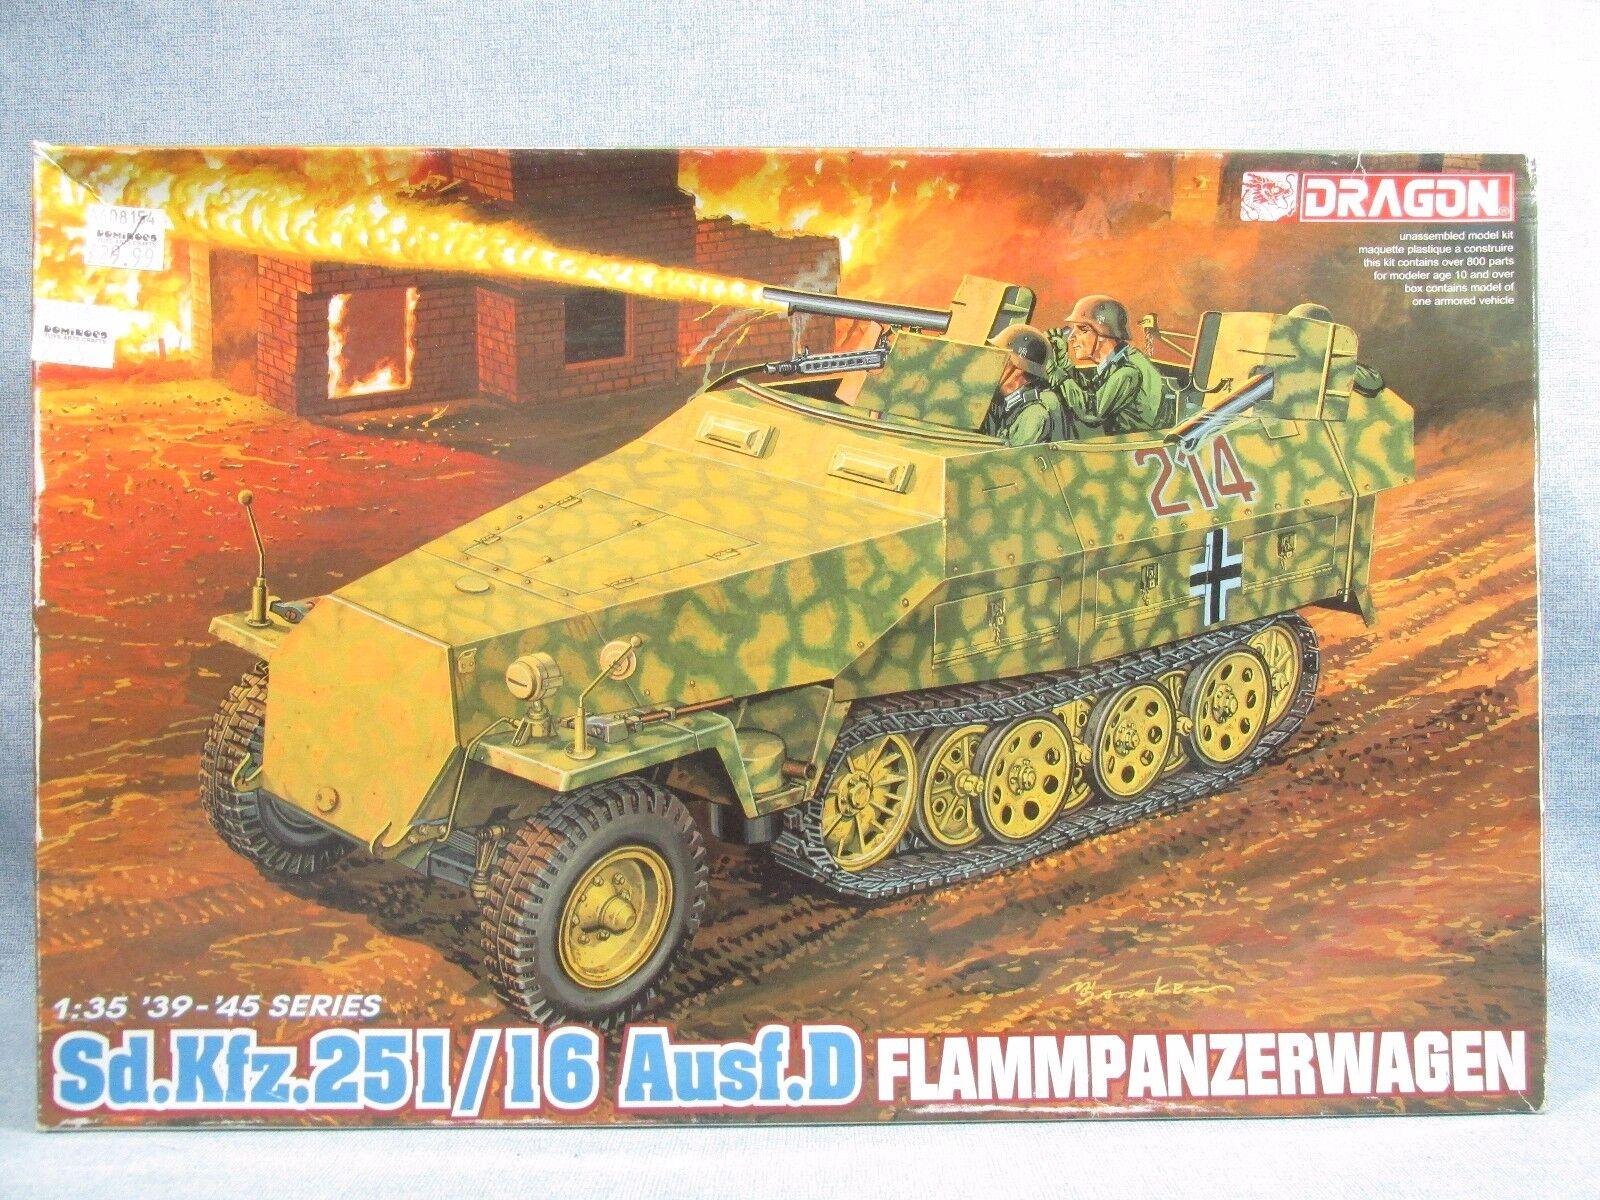 DRAGON model kit 6247 - Open Box - Flammpanzerwagen Sd.Kfz.251 16 Ausf D - 1 35